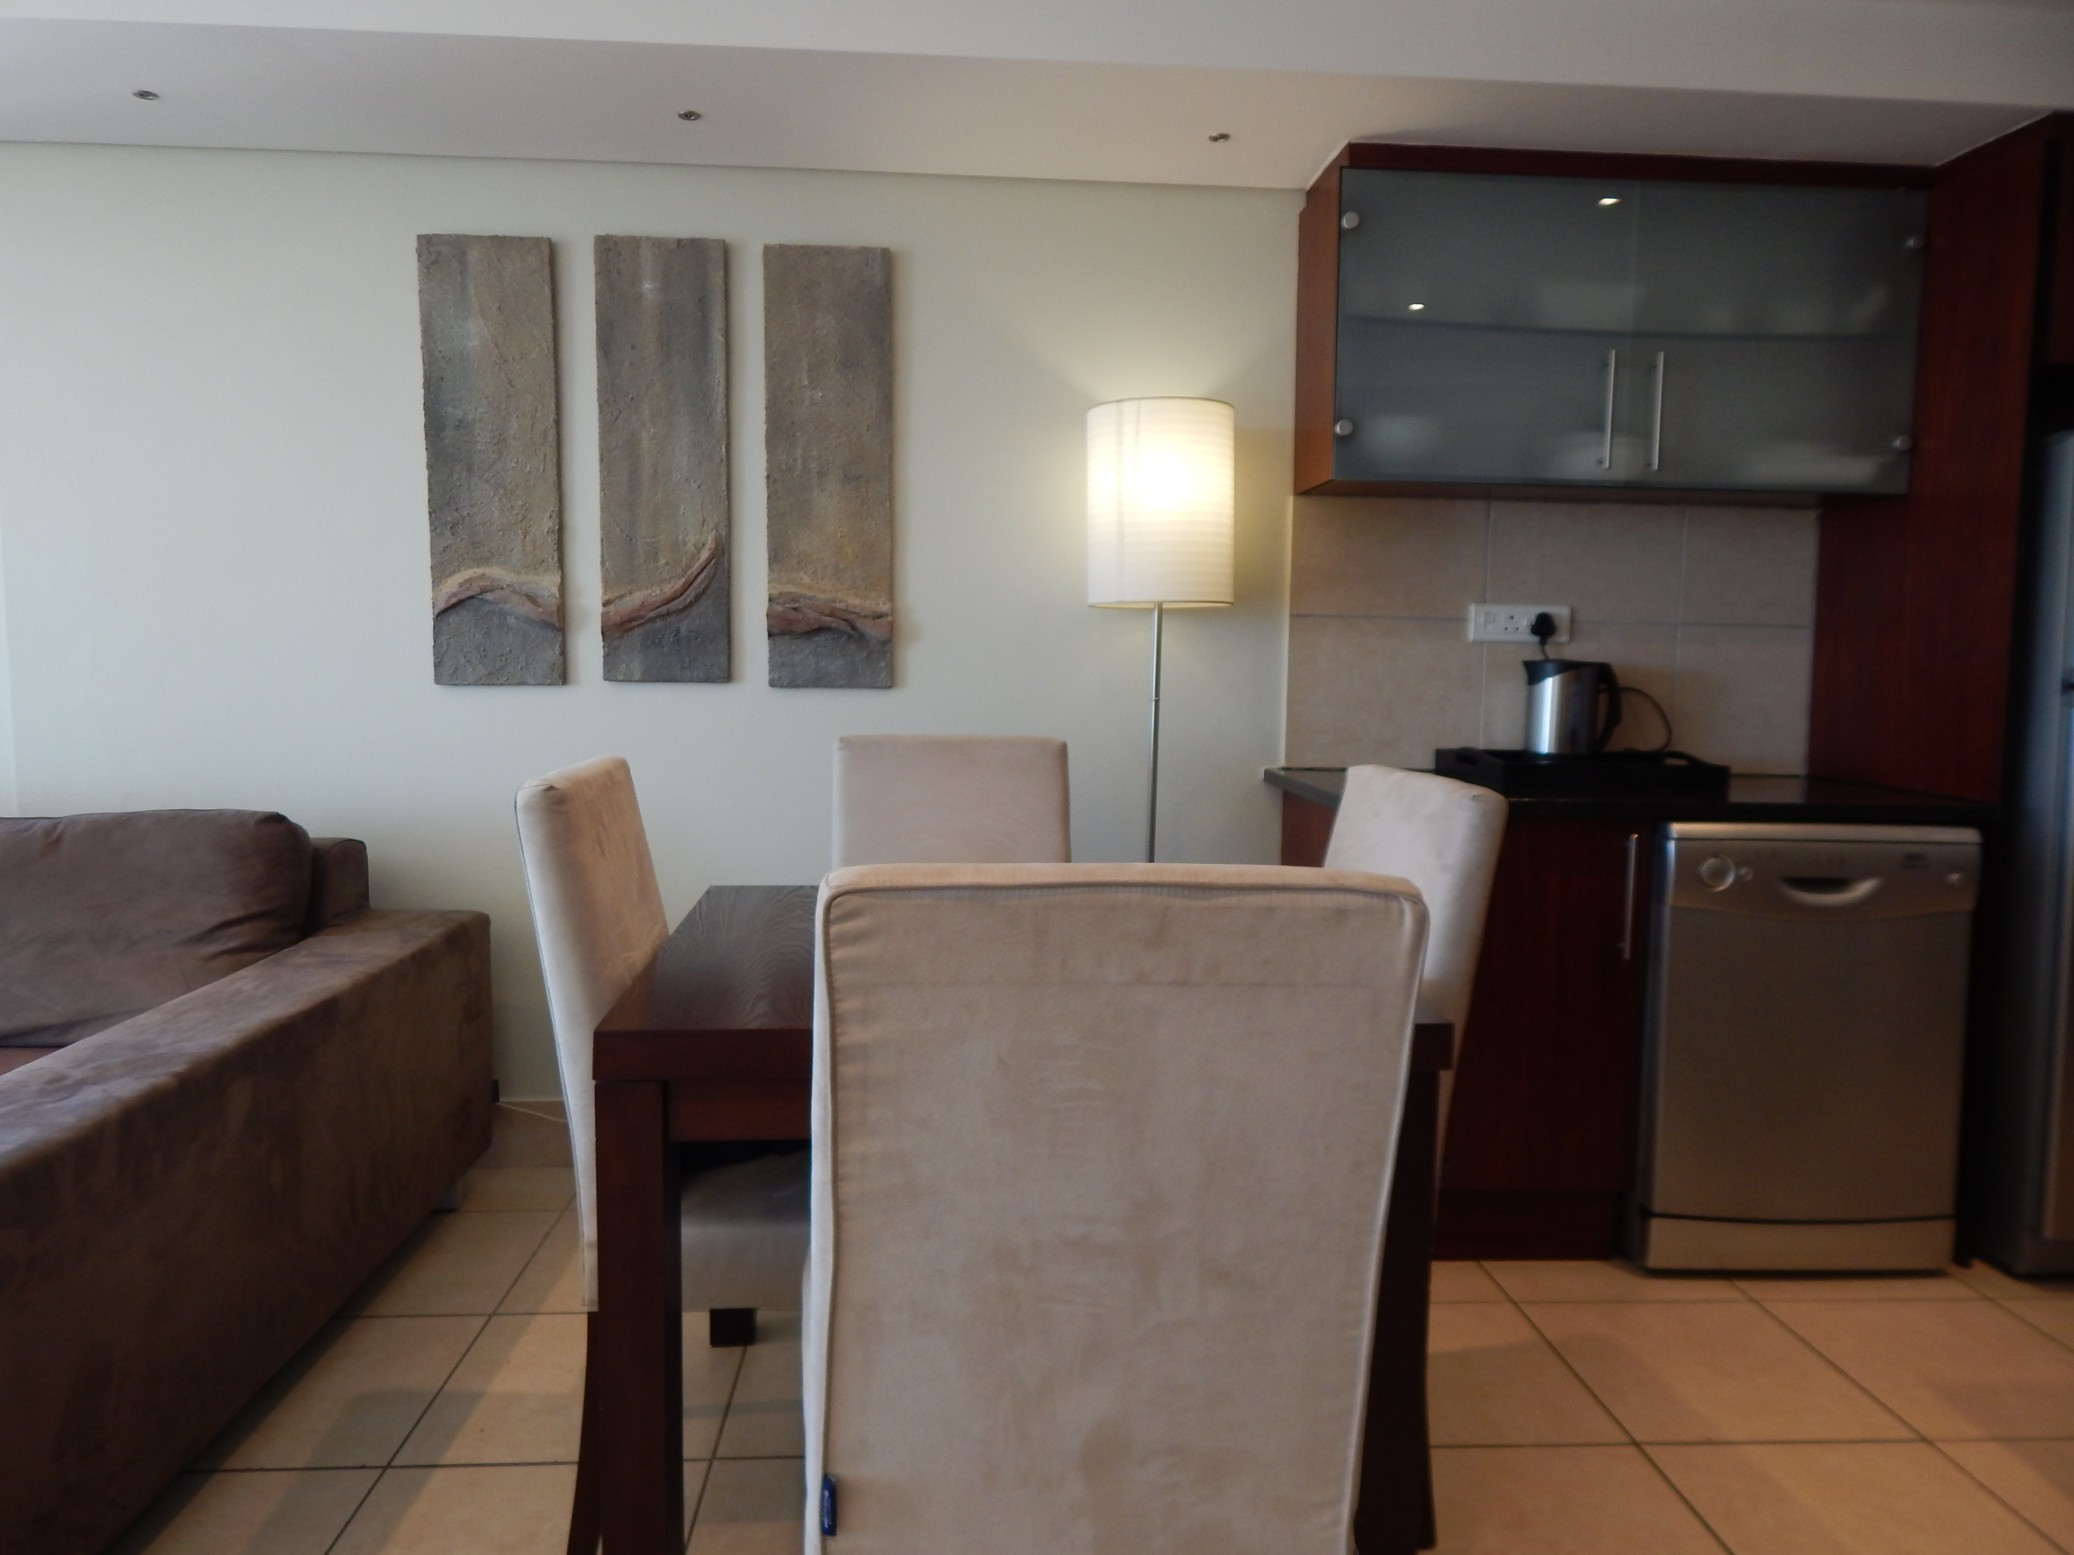 2 Bedroom Apartment for sale in De Bakke ENT0067862 : photo#9